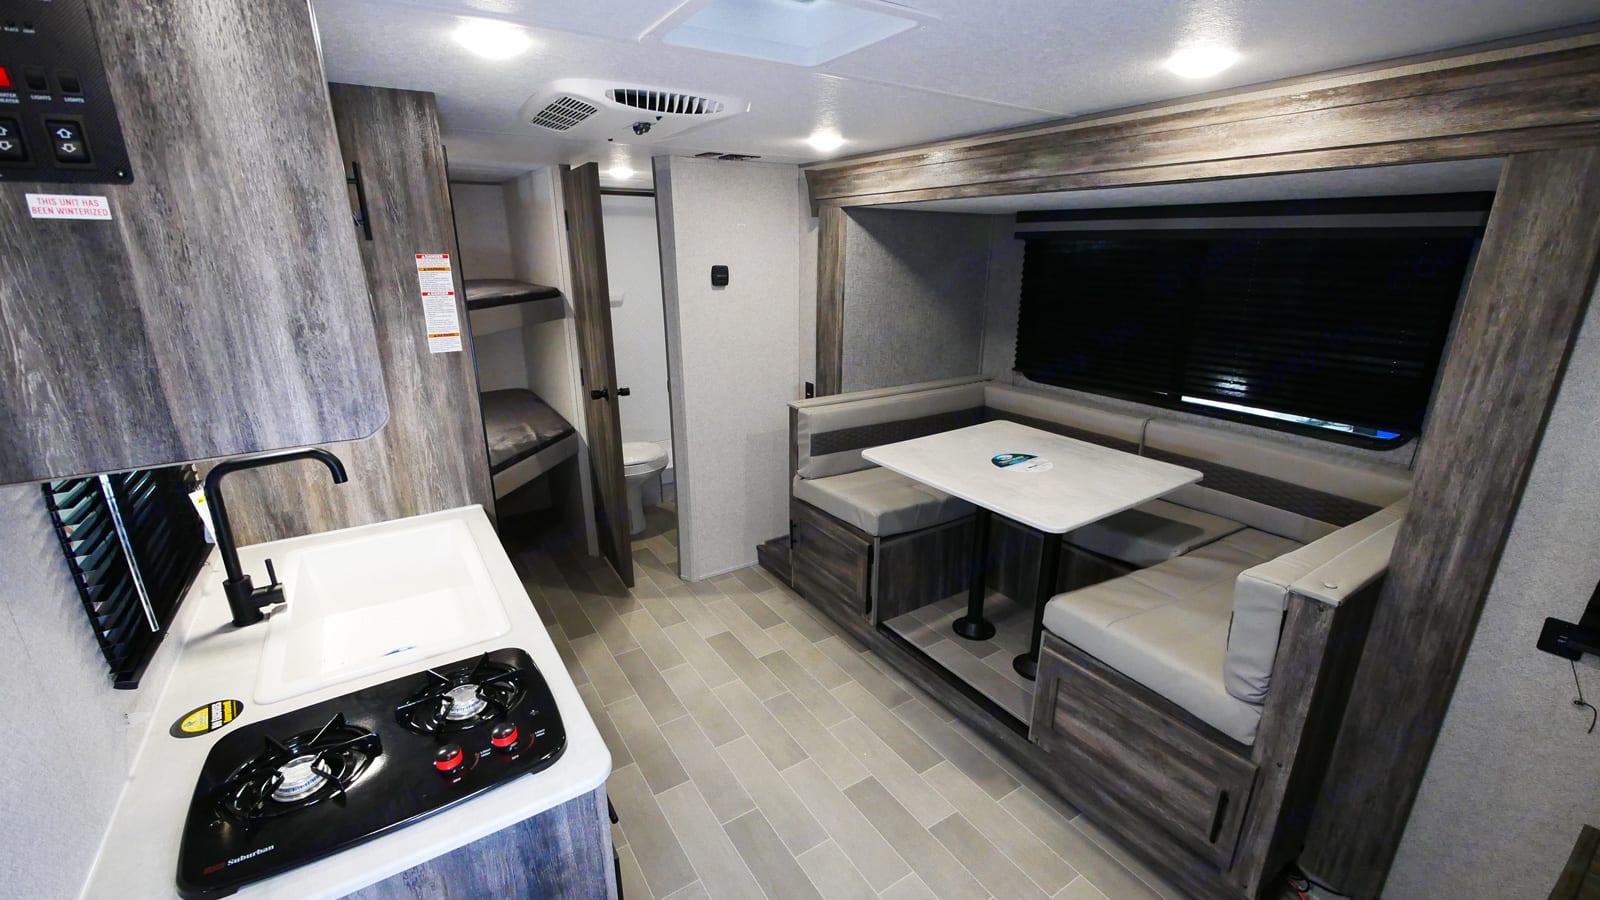 Kitchen, bunks, bath. Forest River Salem 2021